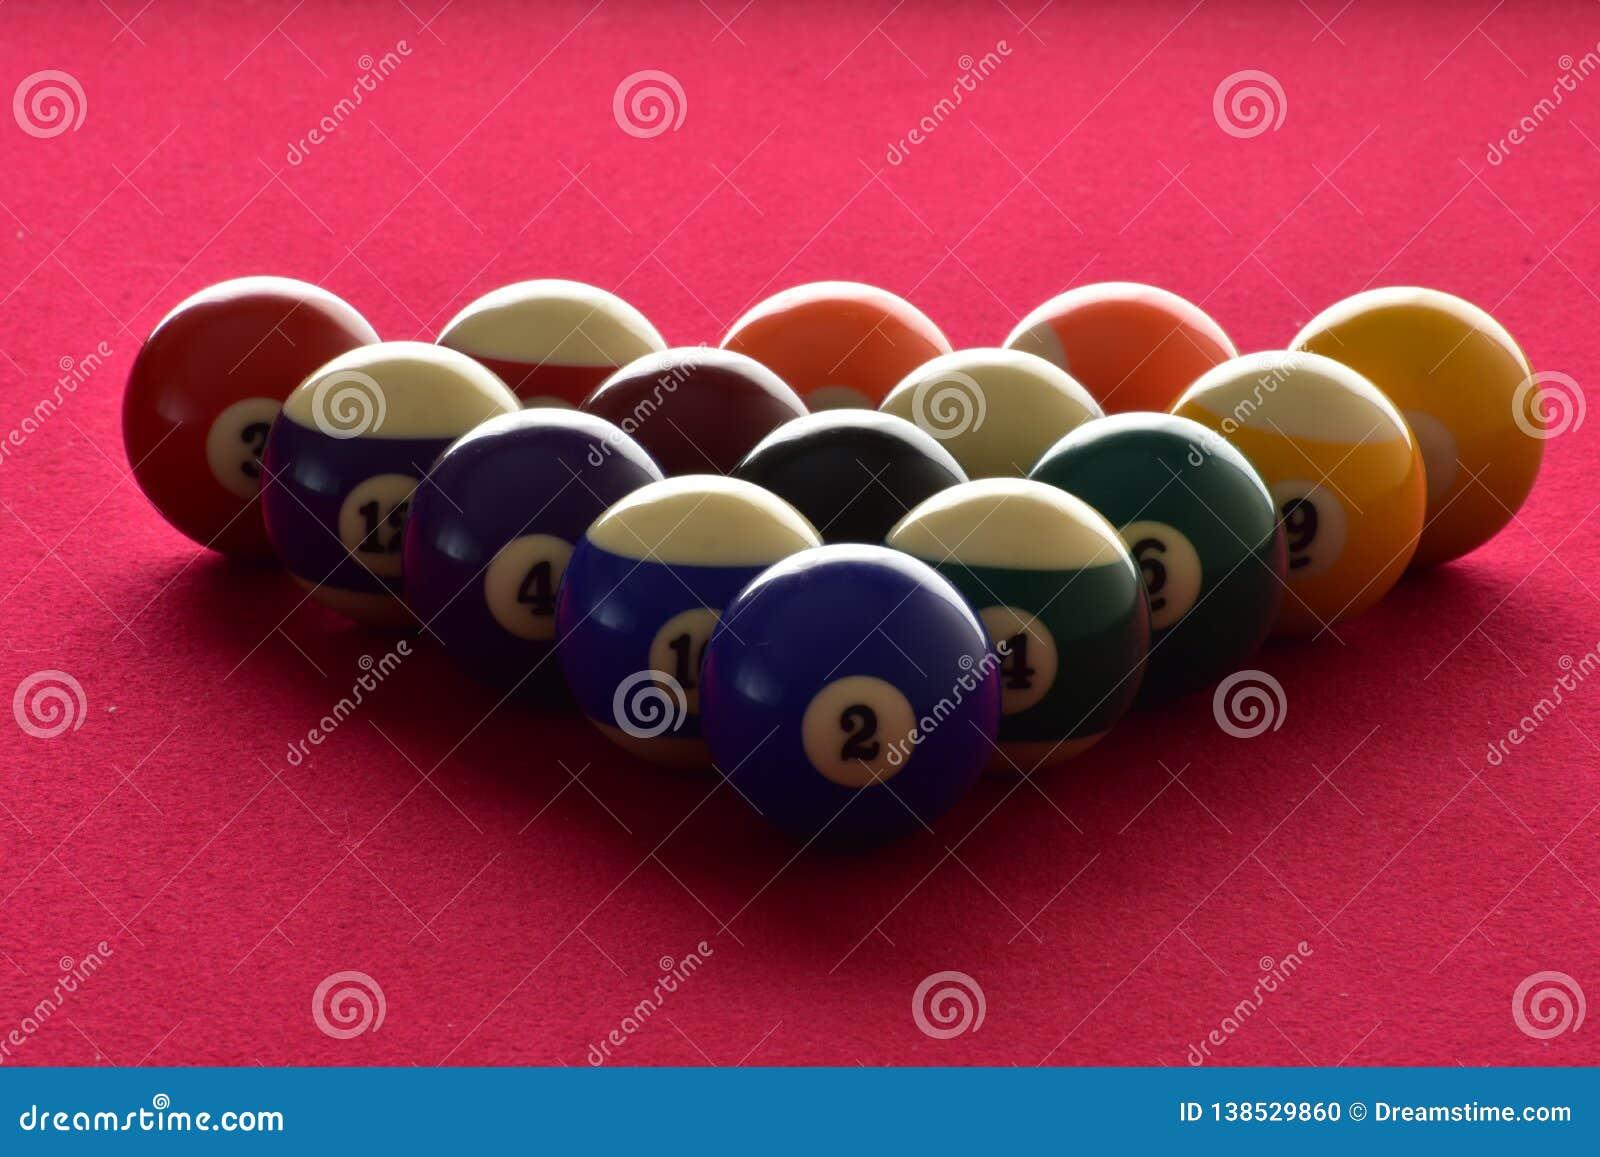 Boules de billard sur une table de billard sentie rouge